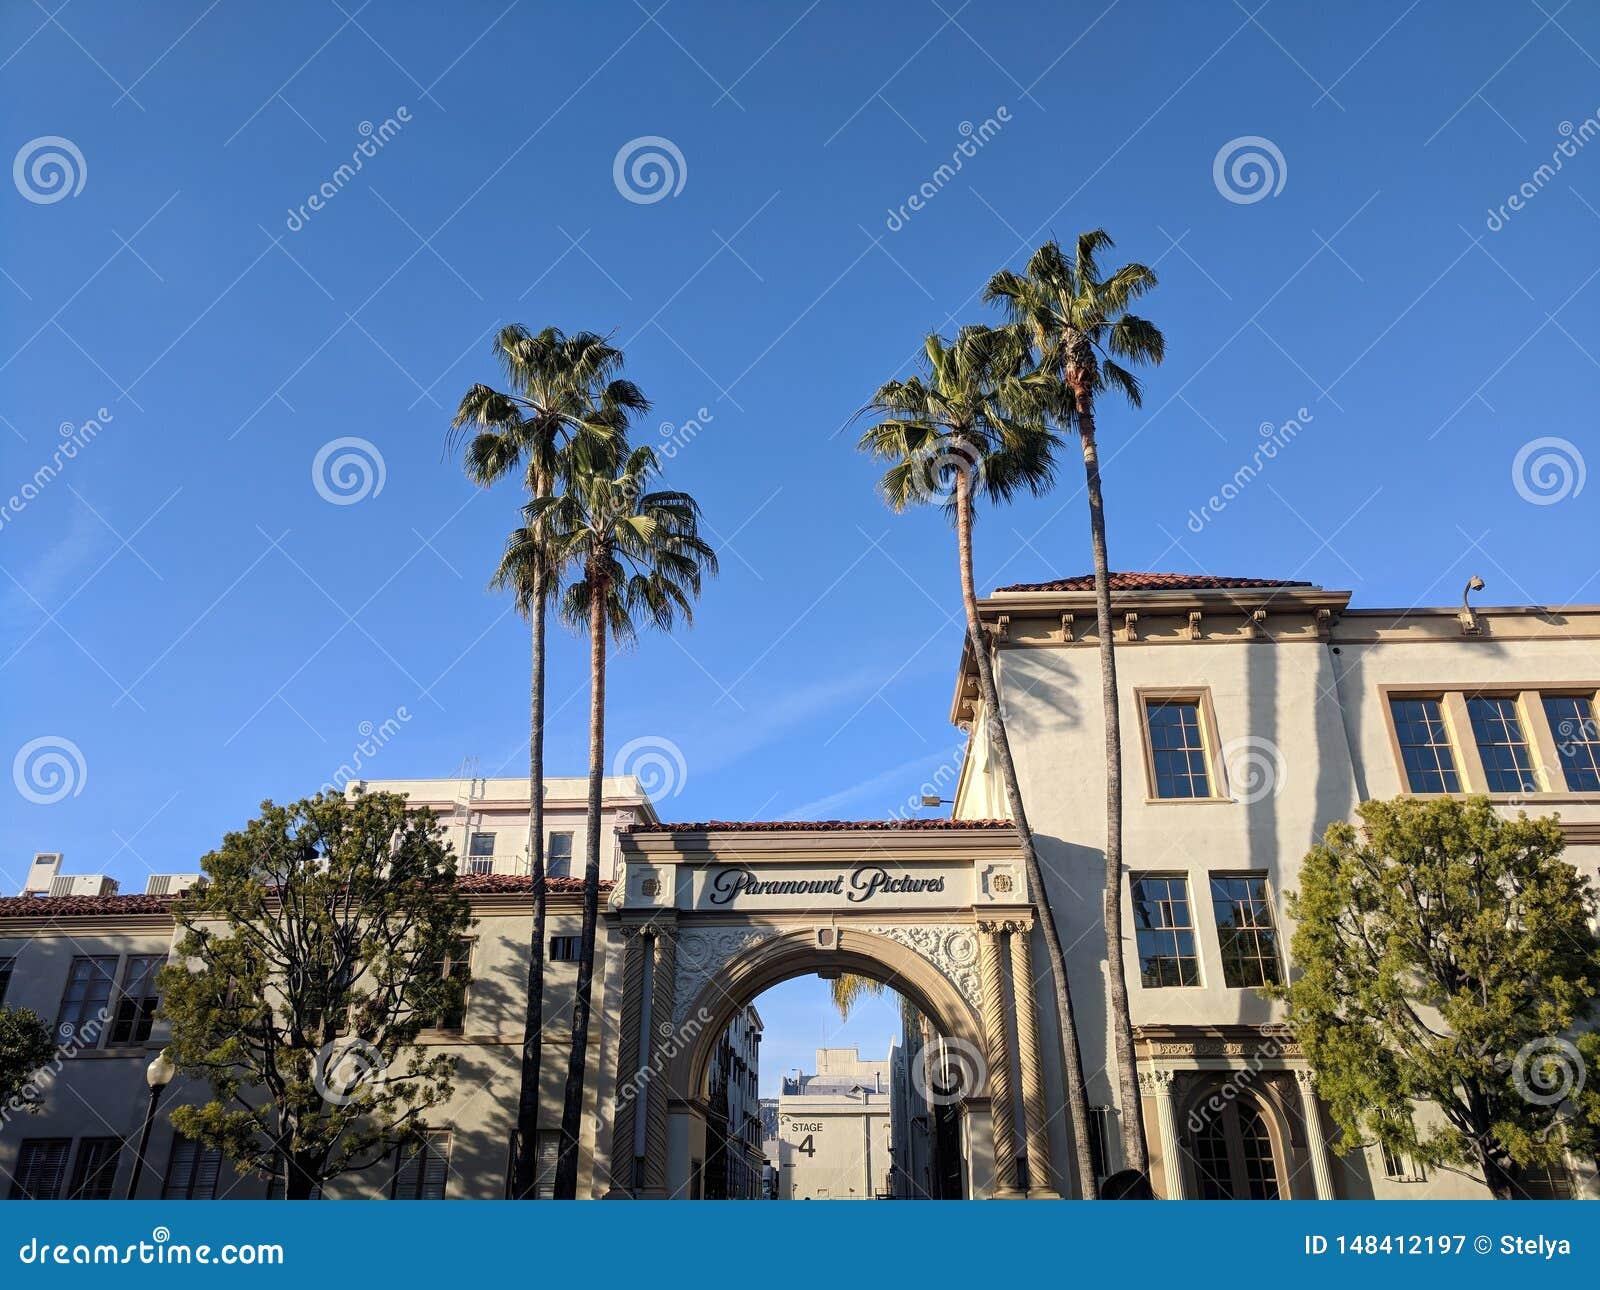 ворота студии Paramount Pictures редакционное фотография